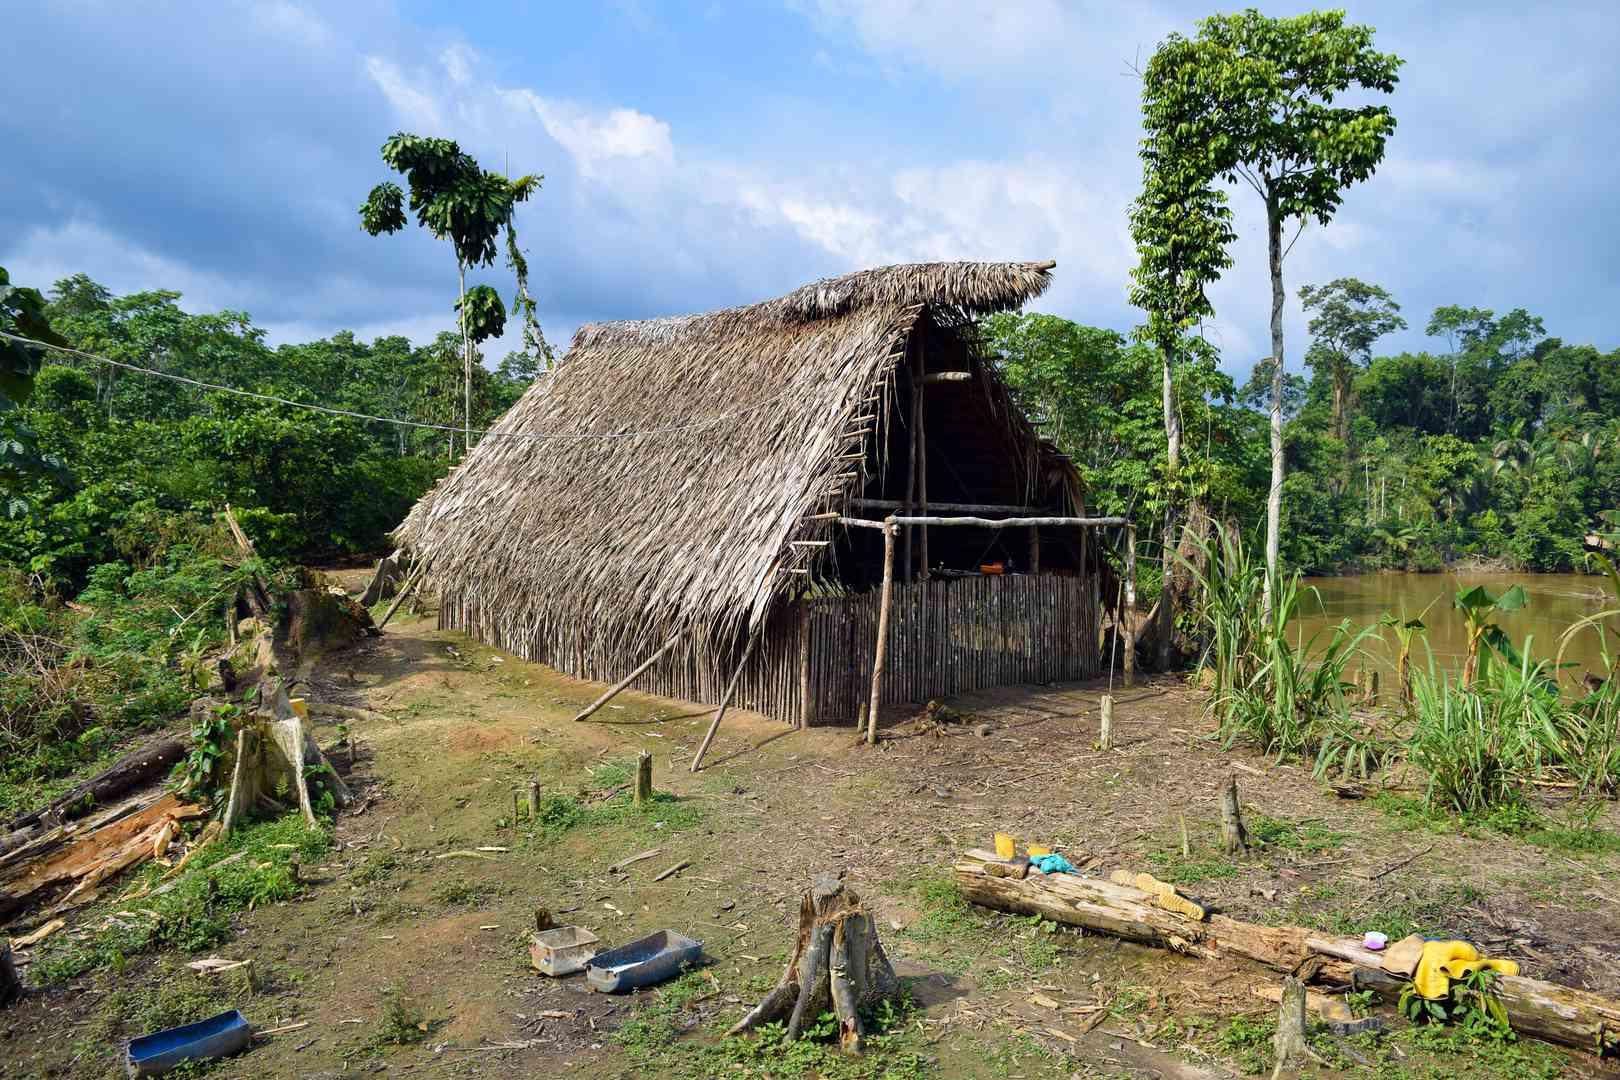 Waorani community